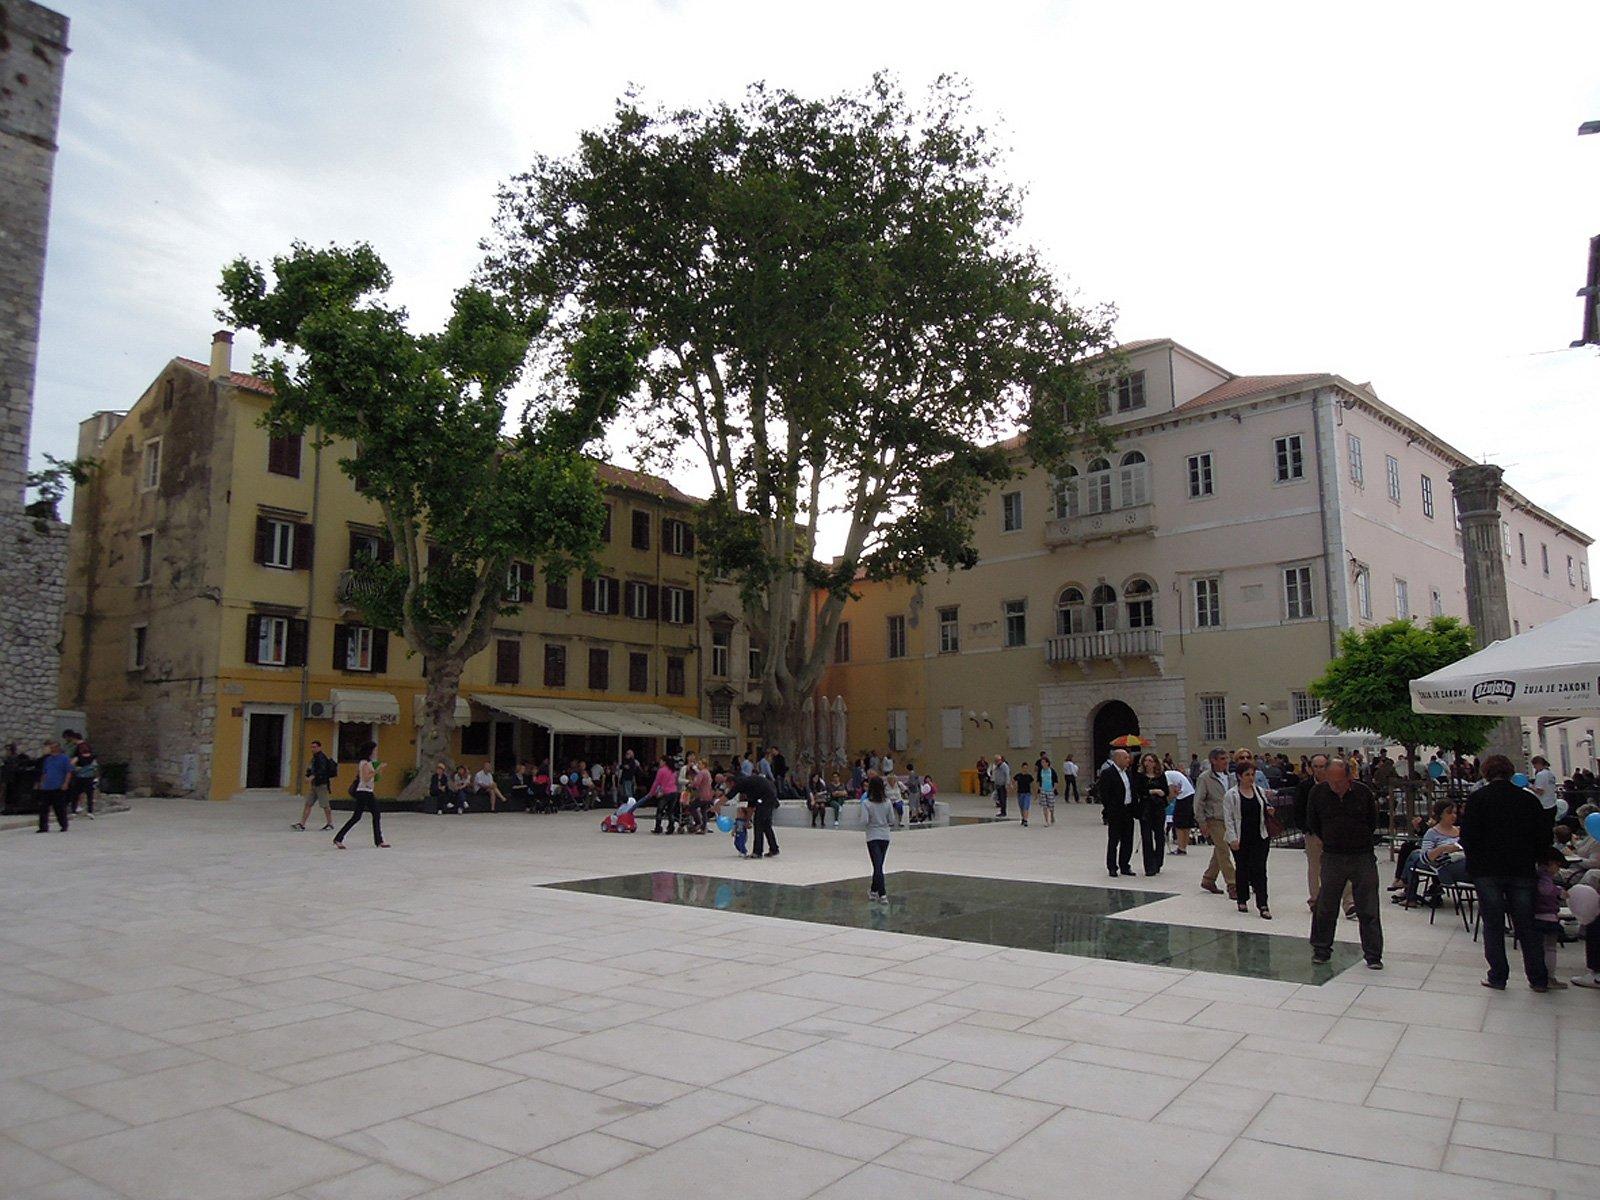 Trg-Zadar1